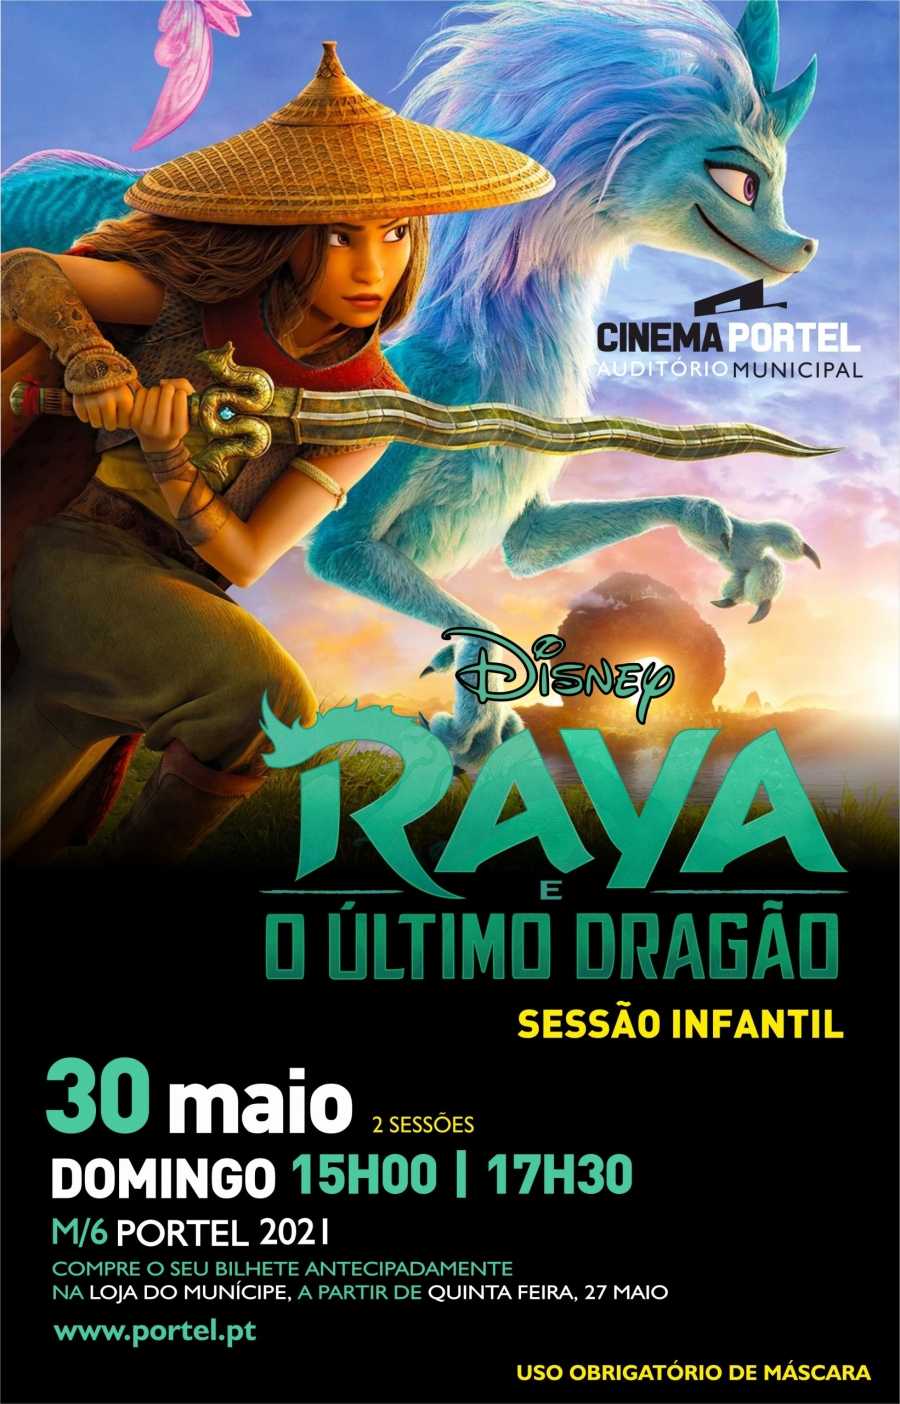 CINEMA: Raya e o último dragão